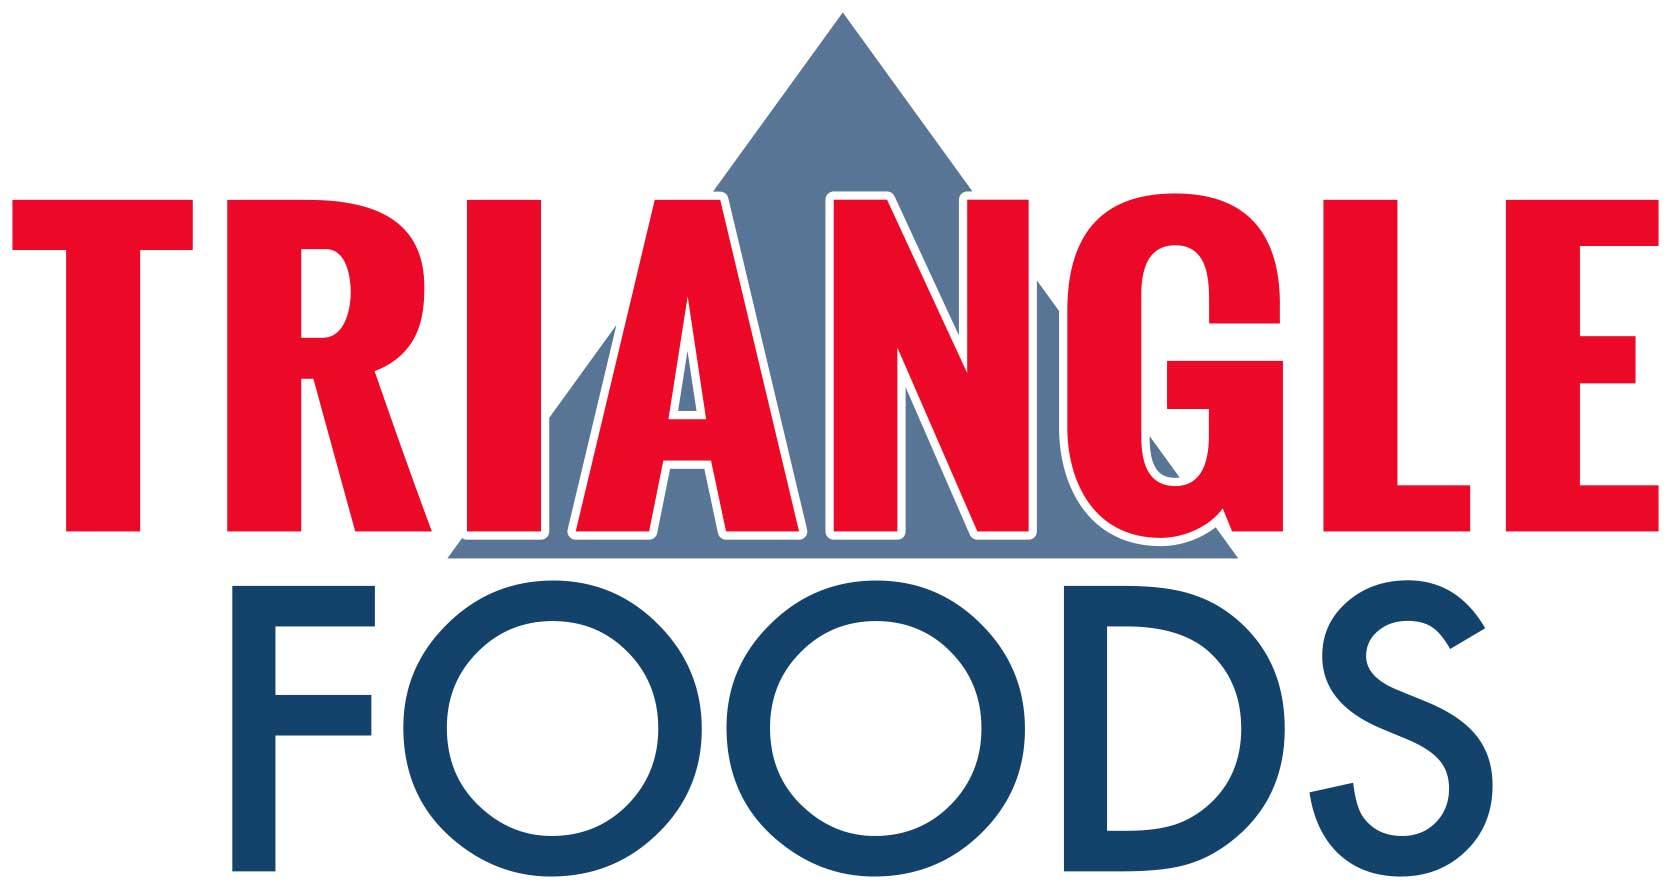 TriangleLogo.jpg